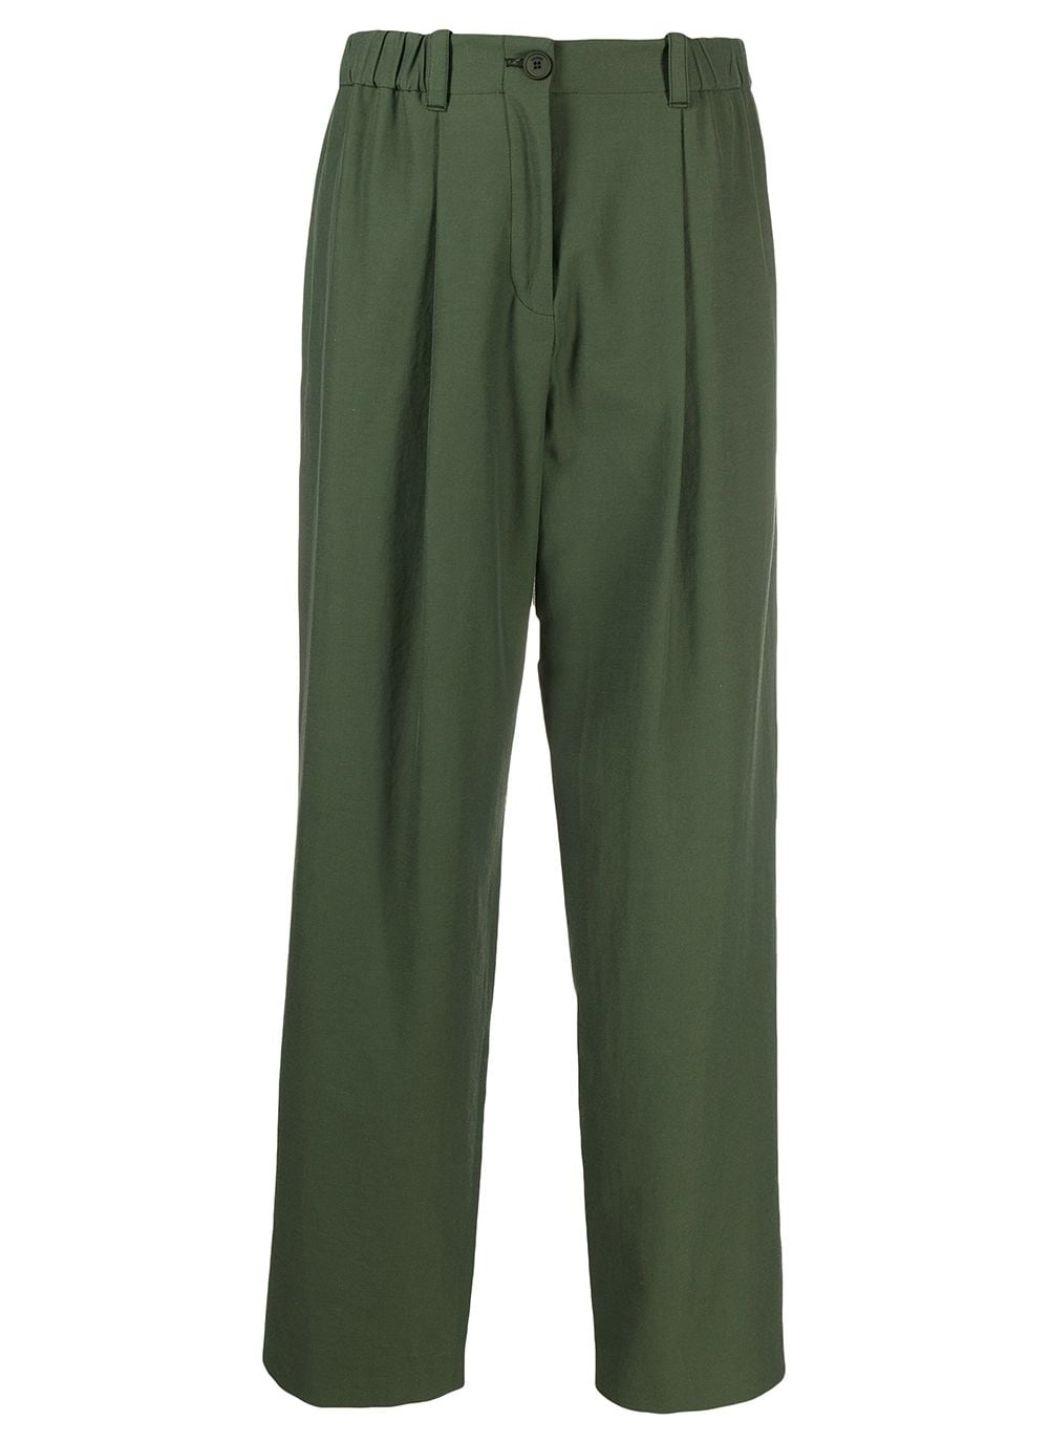 Pantalone tailored